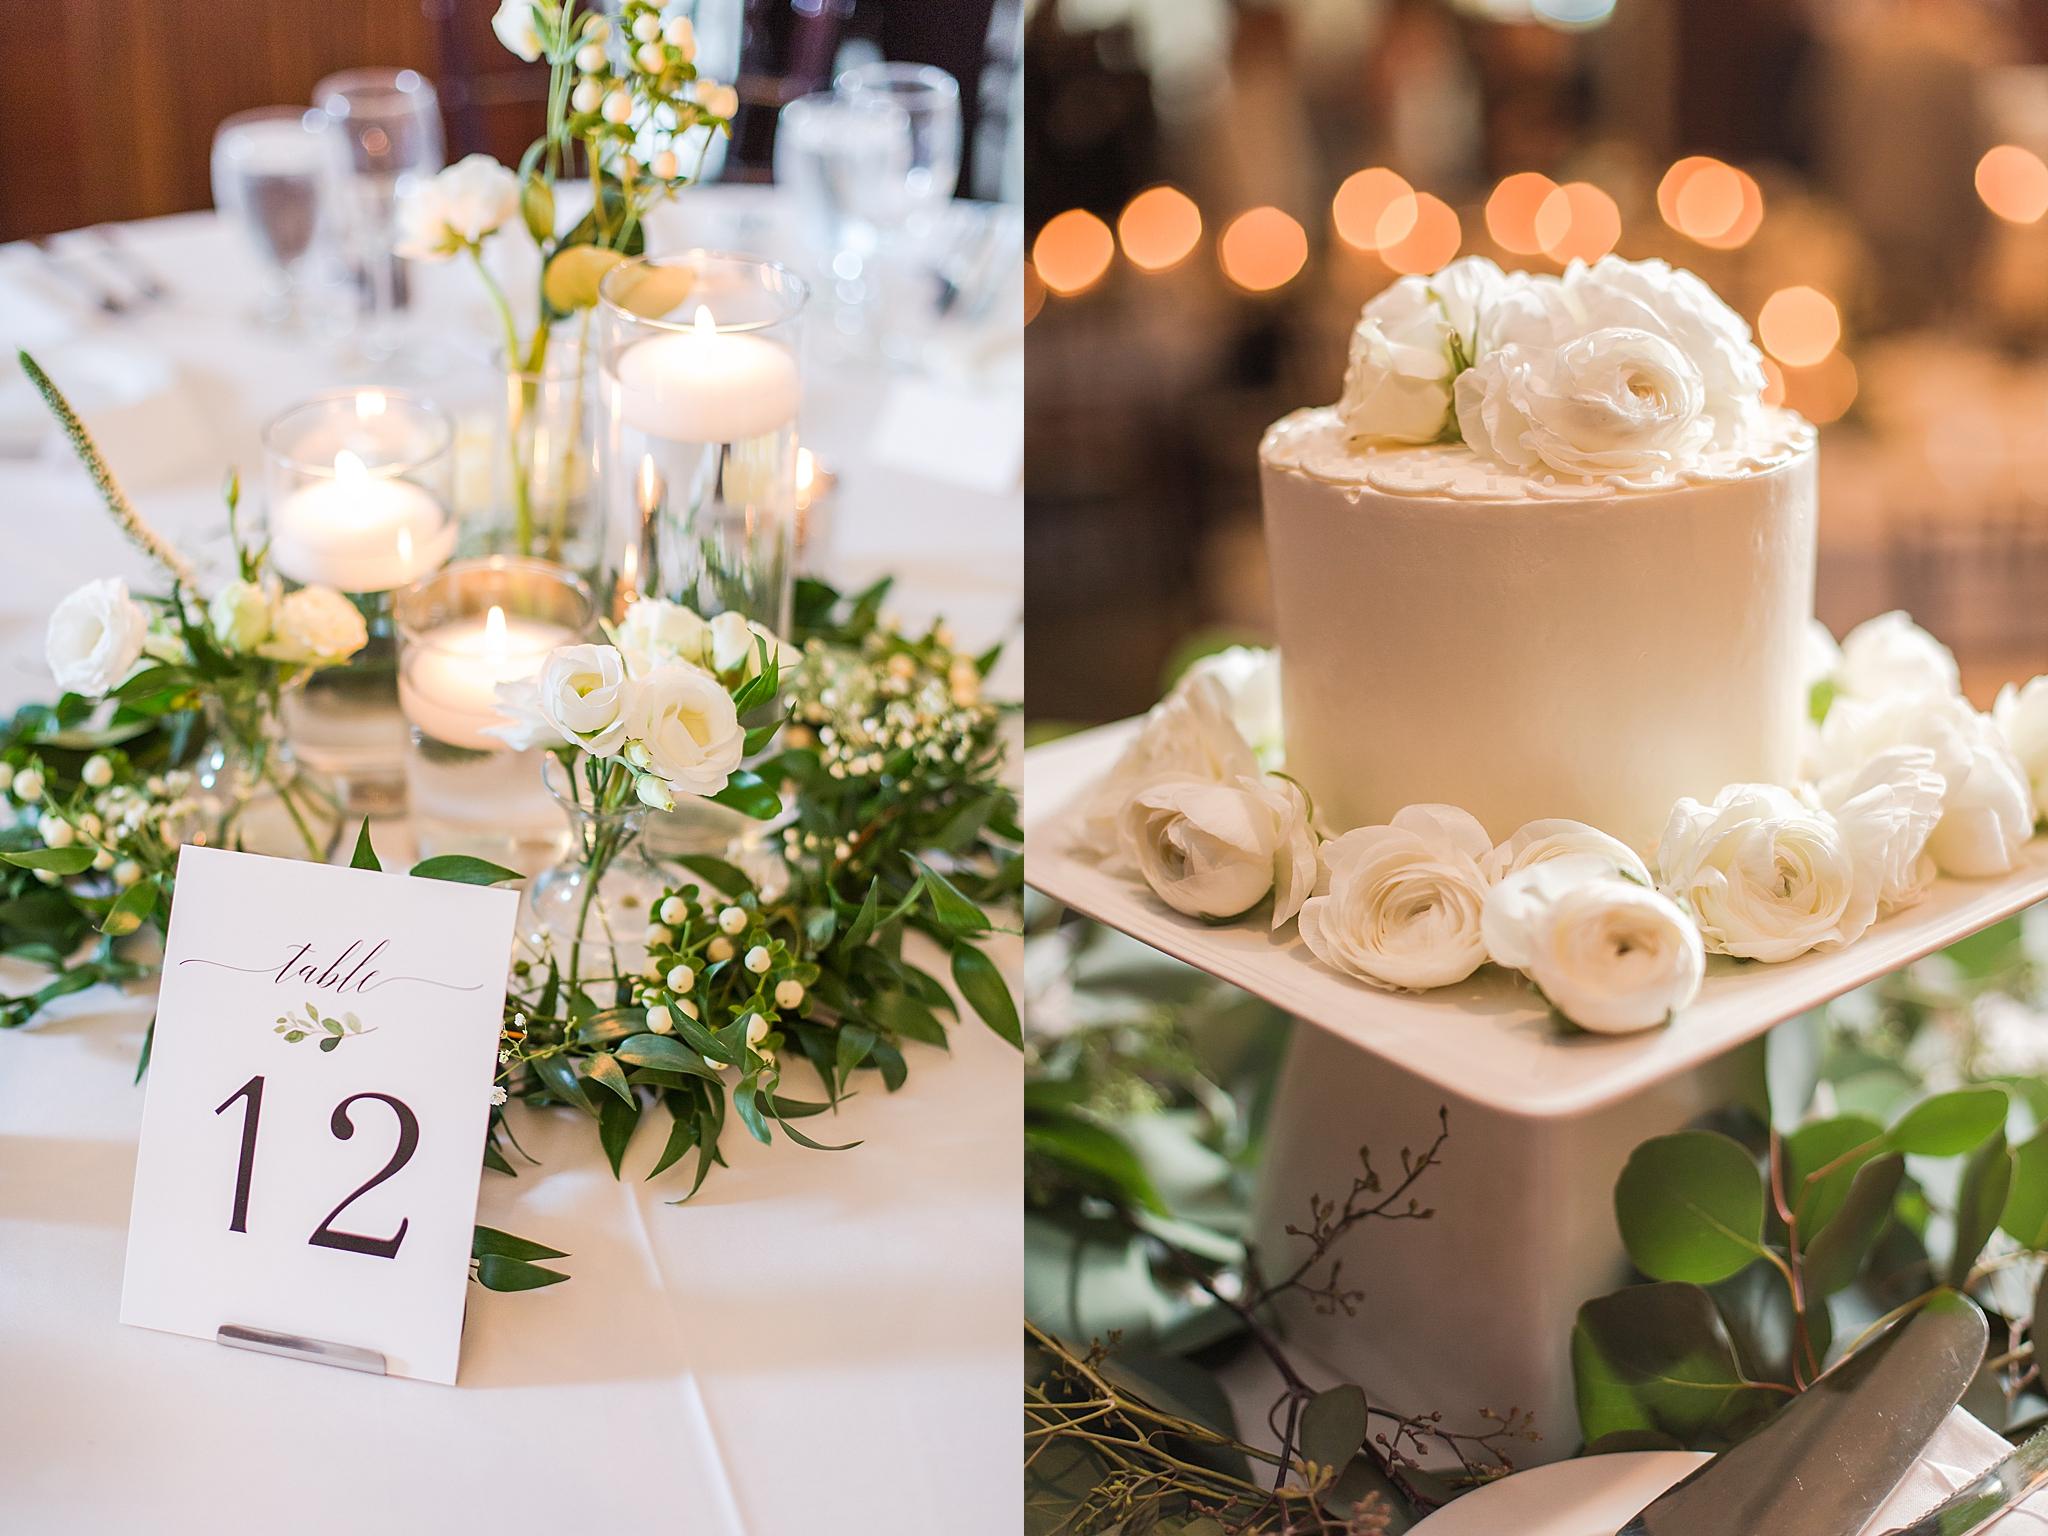 detroit-wedding-photographer-grosse-pointe-academy-chapel-detroit-golf-club-wedding-carly-matt-by-courtney-carolyn-photography_0085.jpg